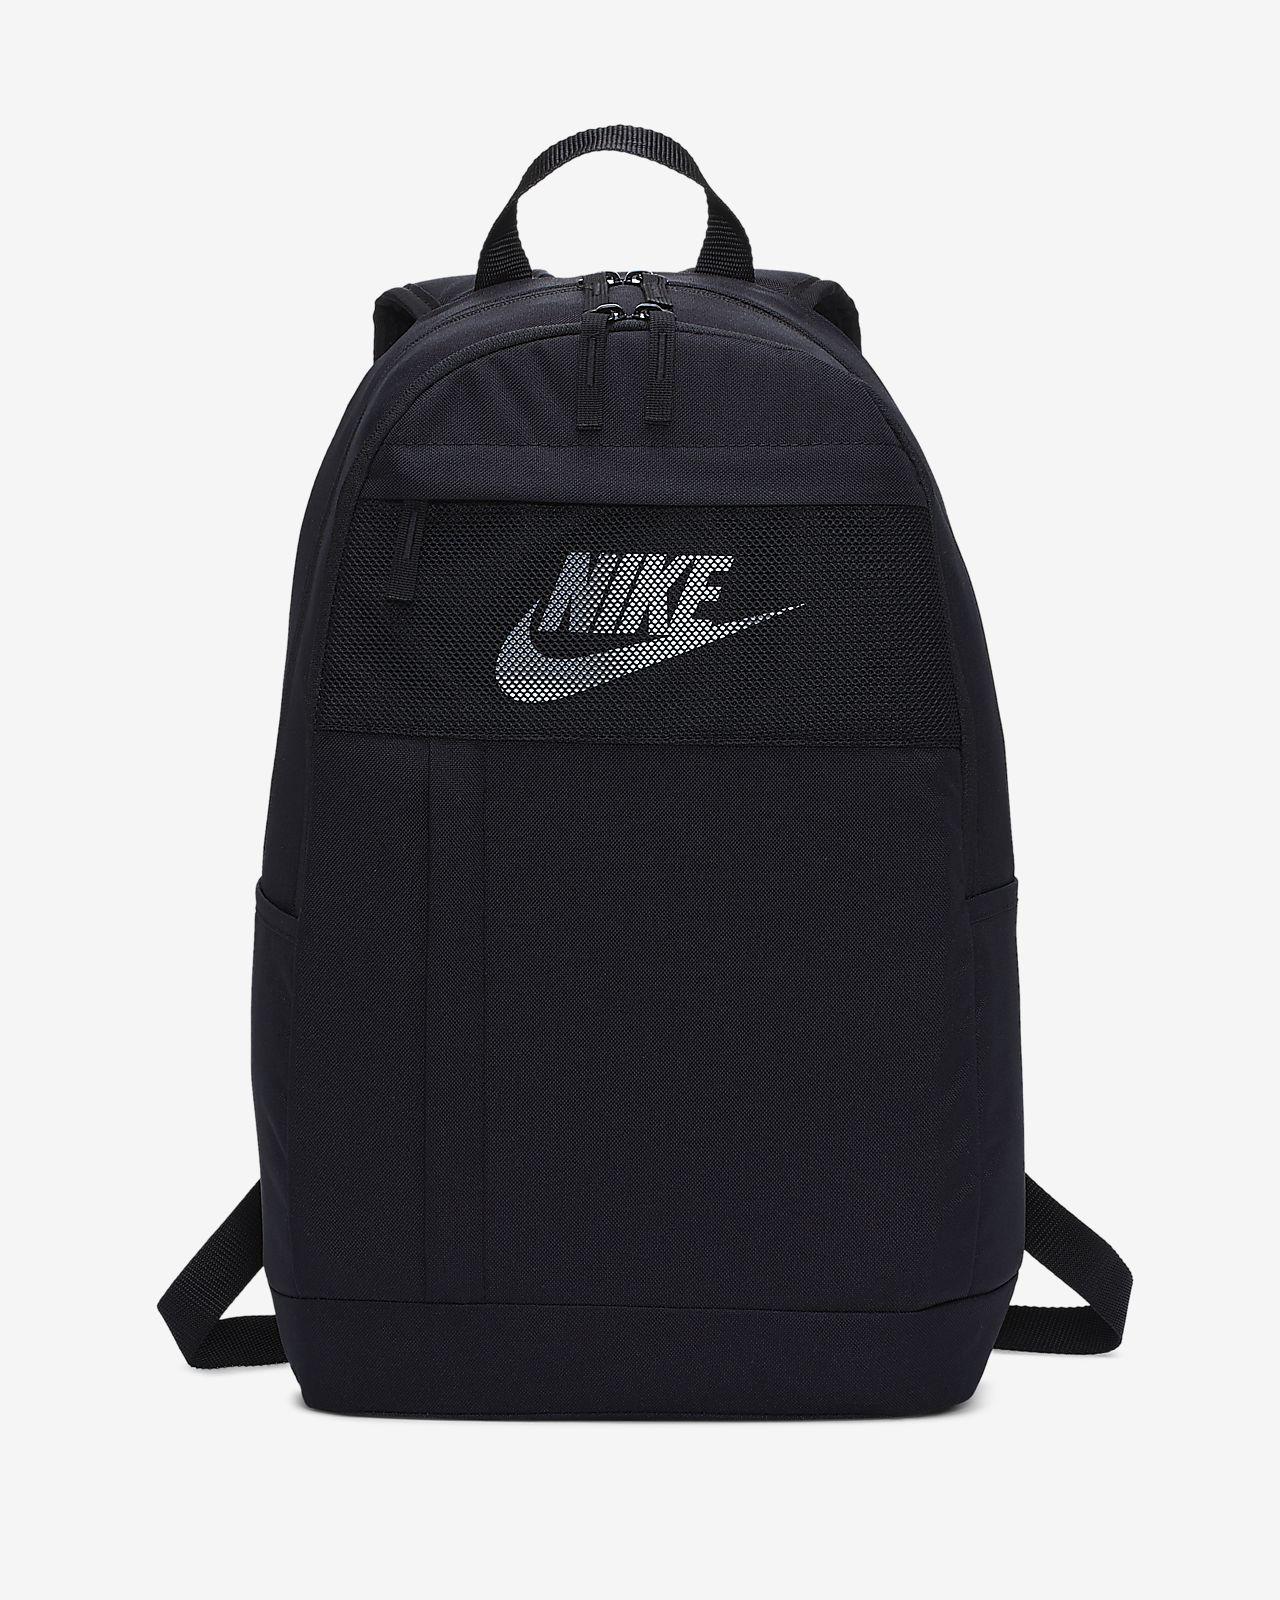 Nike Elemental LBR ryggsekk